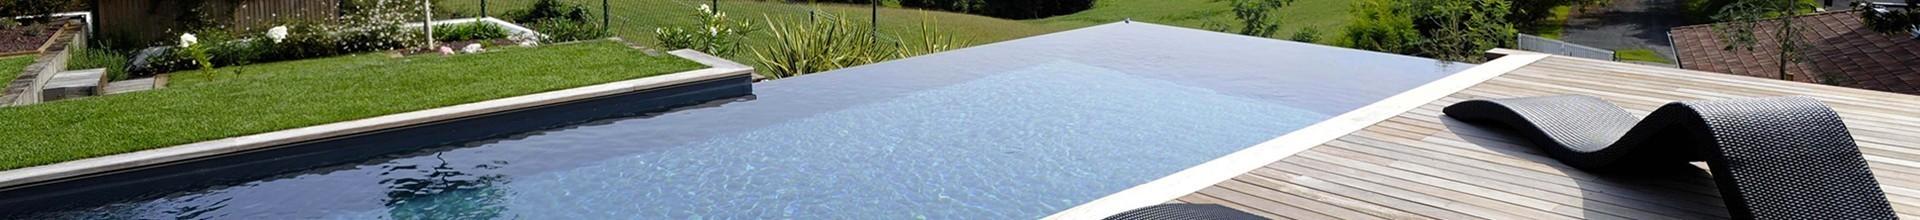 Vente privée piscine, conseils en ligne, expertise et vente